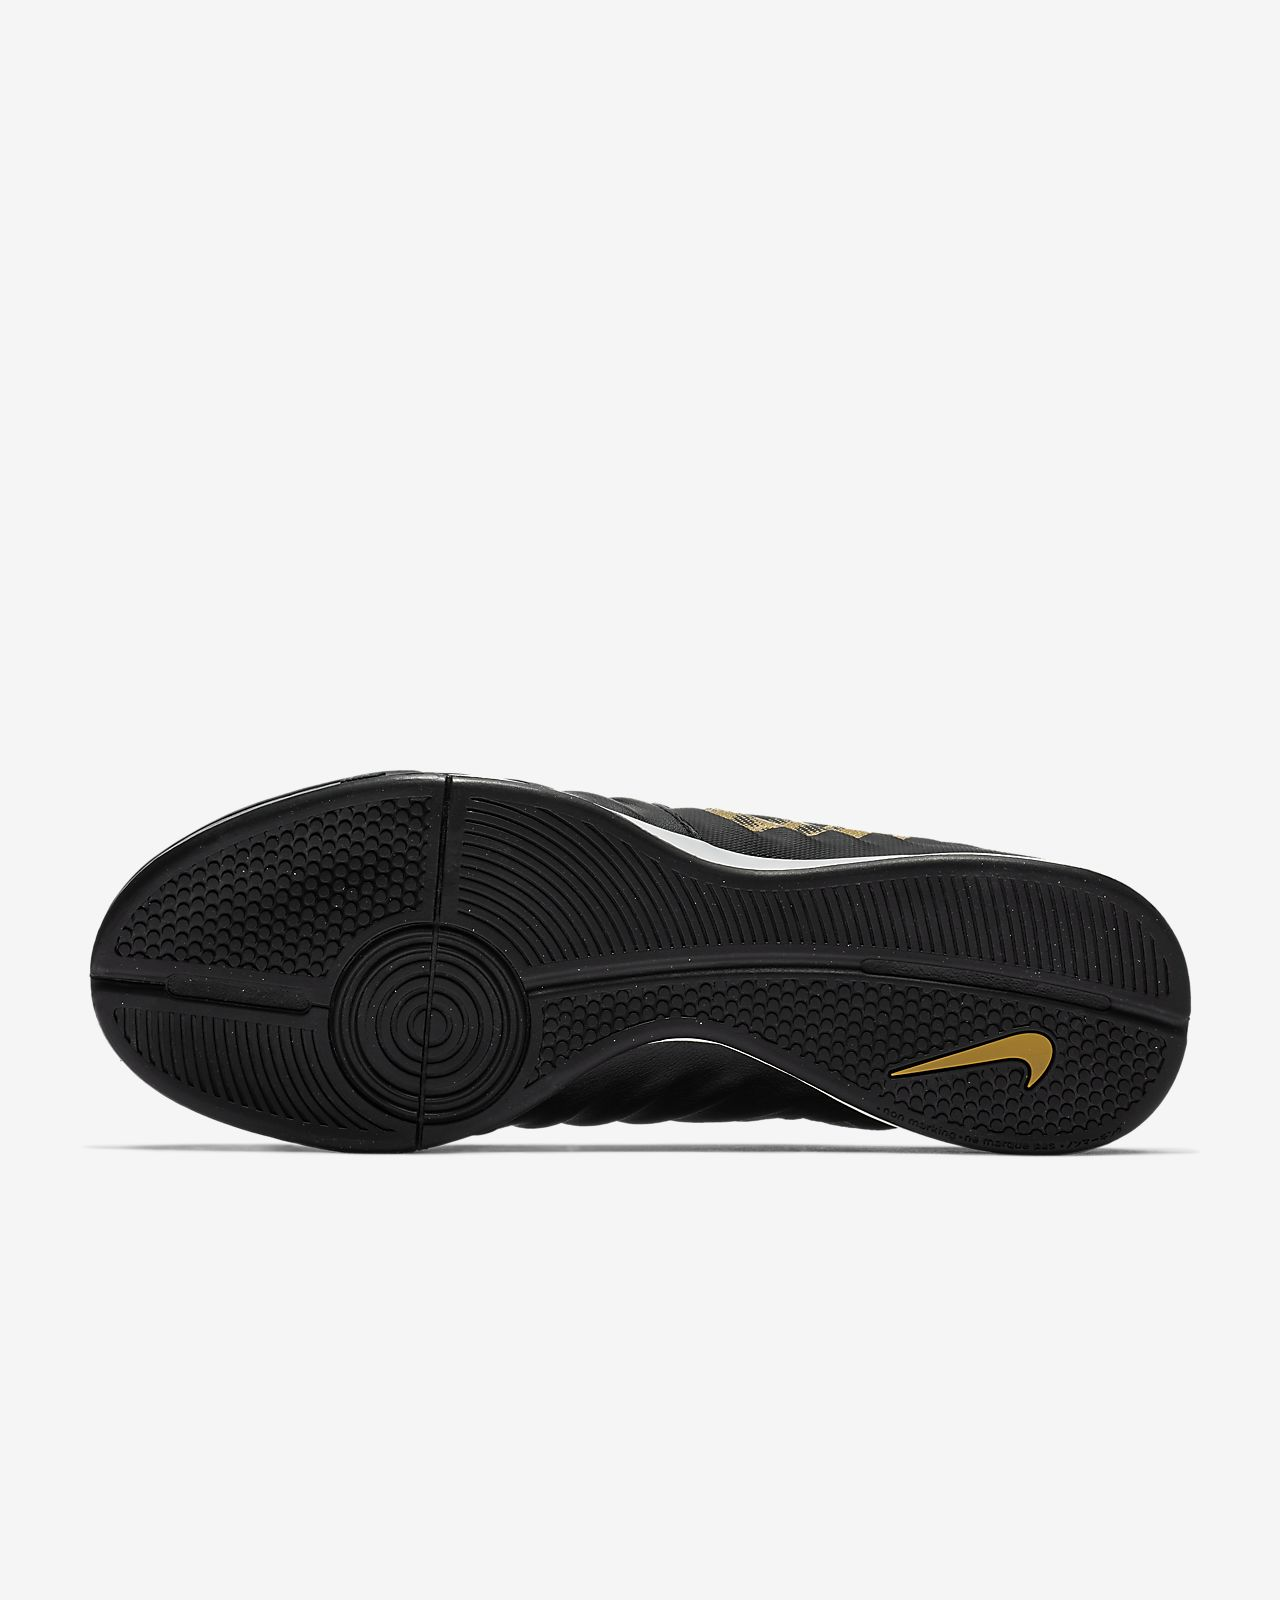 02730bd47b8 Sálová kopačka Nike LegendX 7 Academy IC. Nike.com CZ